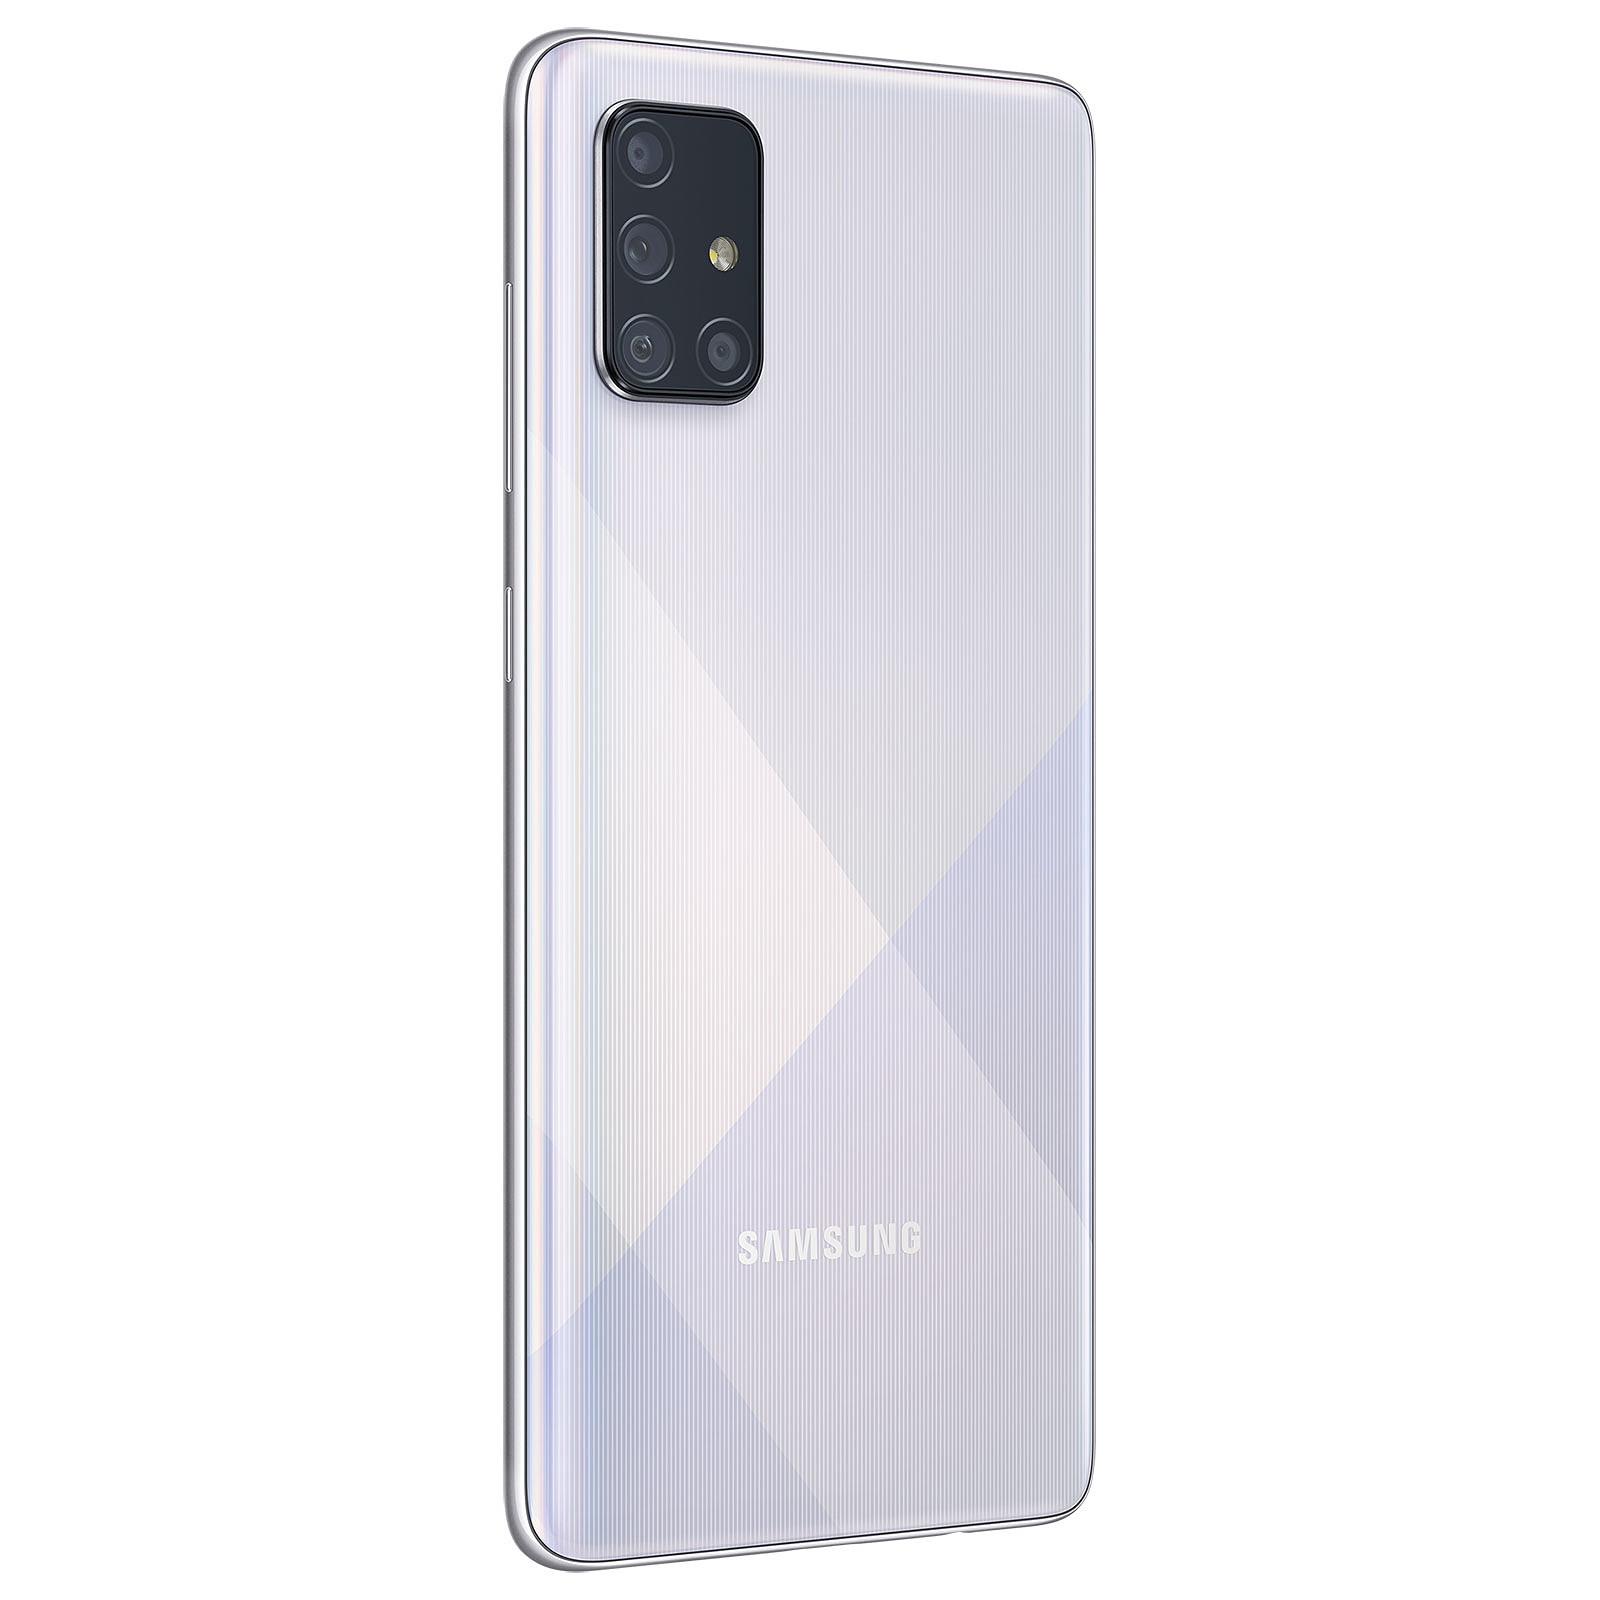 Samsung Galaxy A71 128Go Silver - Téléphonie Samsung - Cybertek.fr - 3